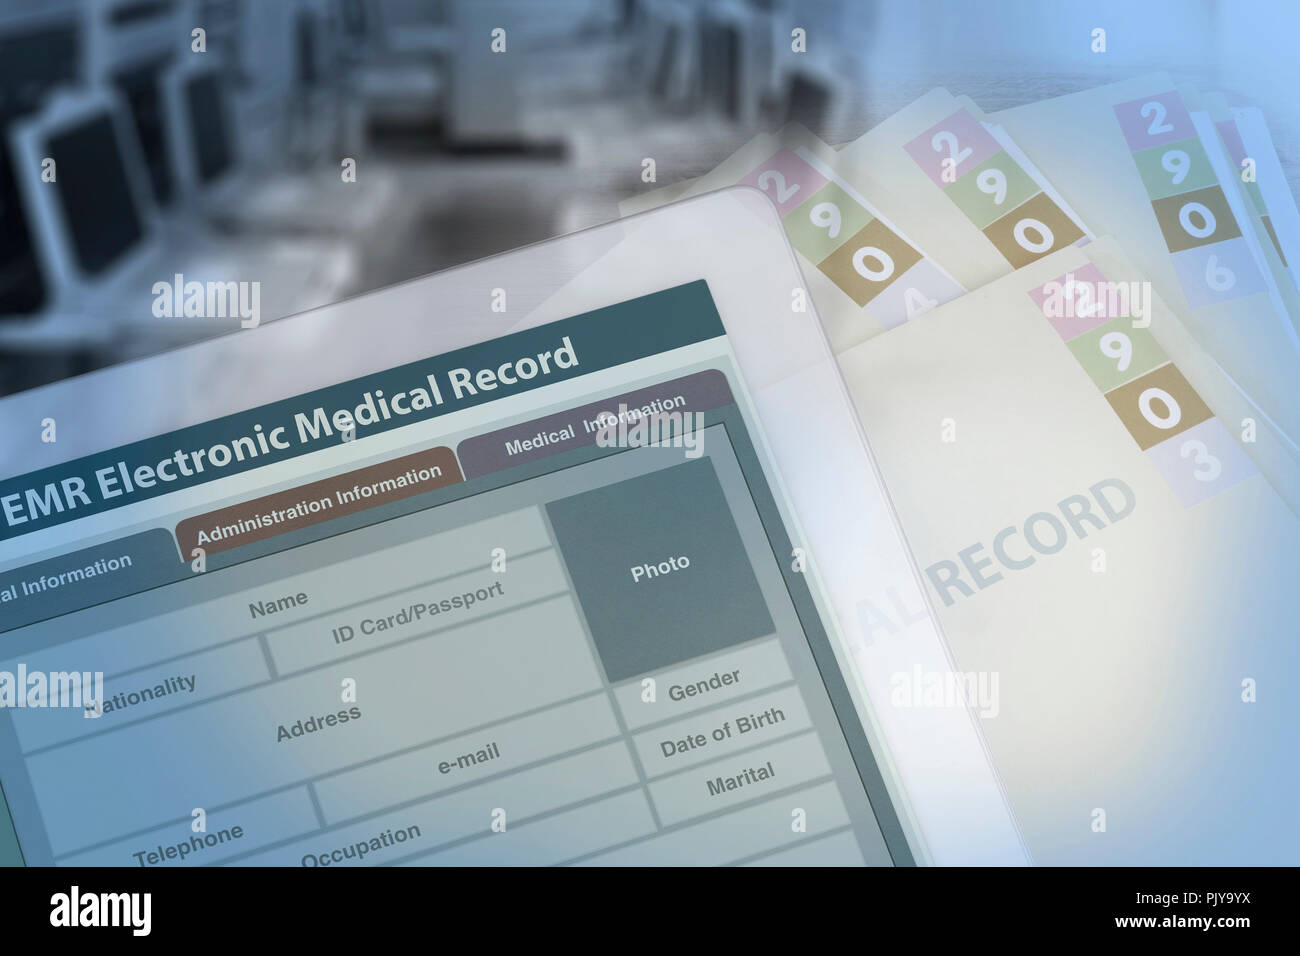 Online-Dating-Technologie